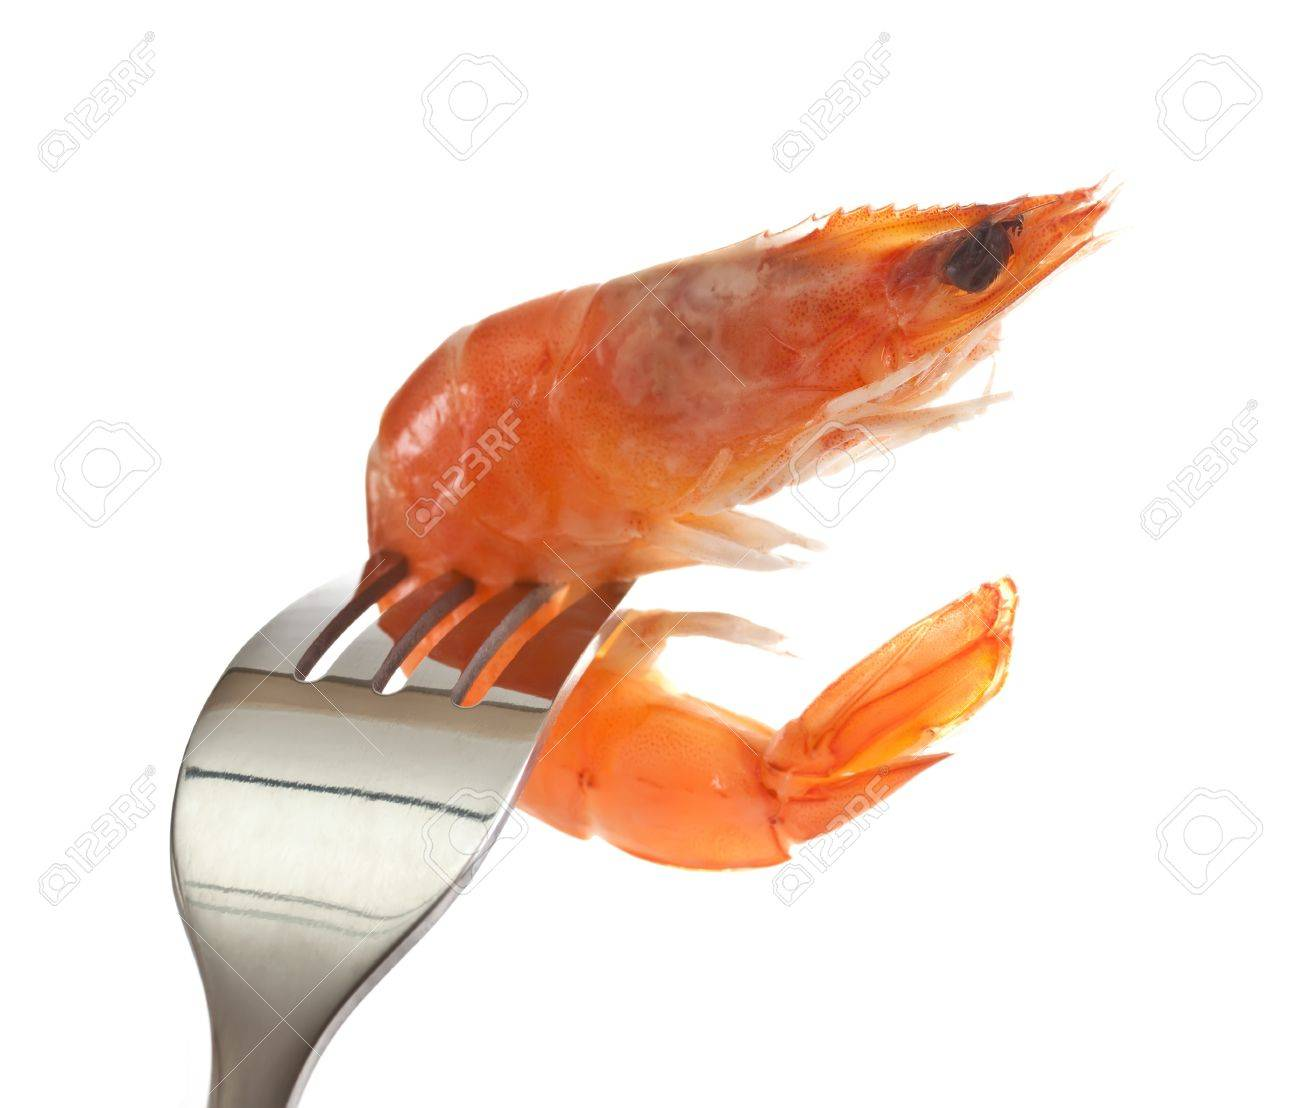 Boiled shrimp on a fork. - 11219213